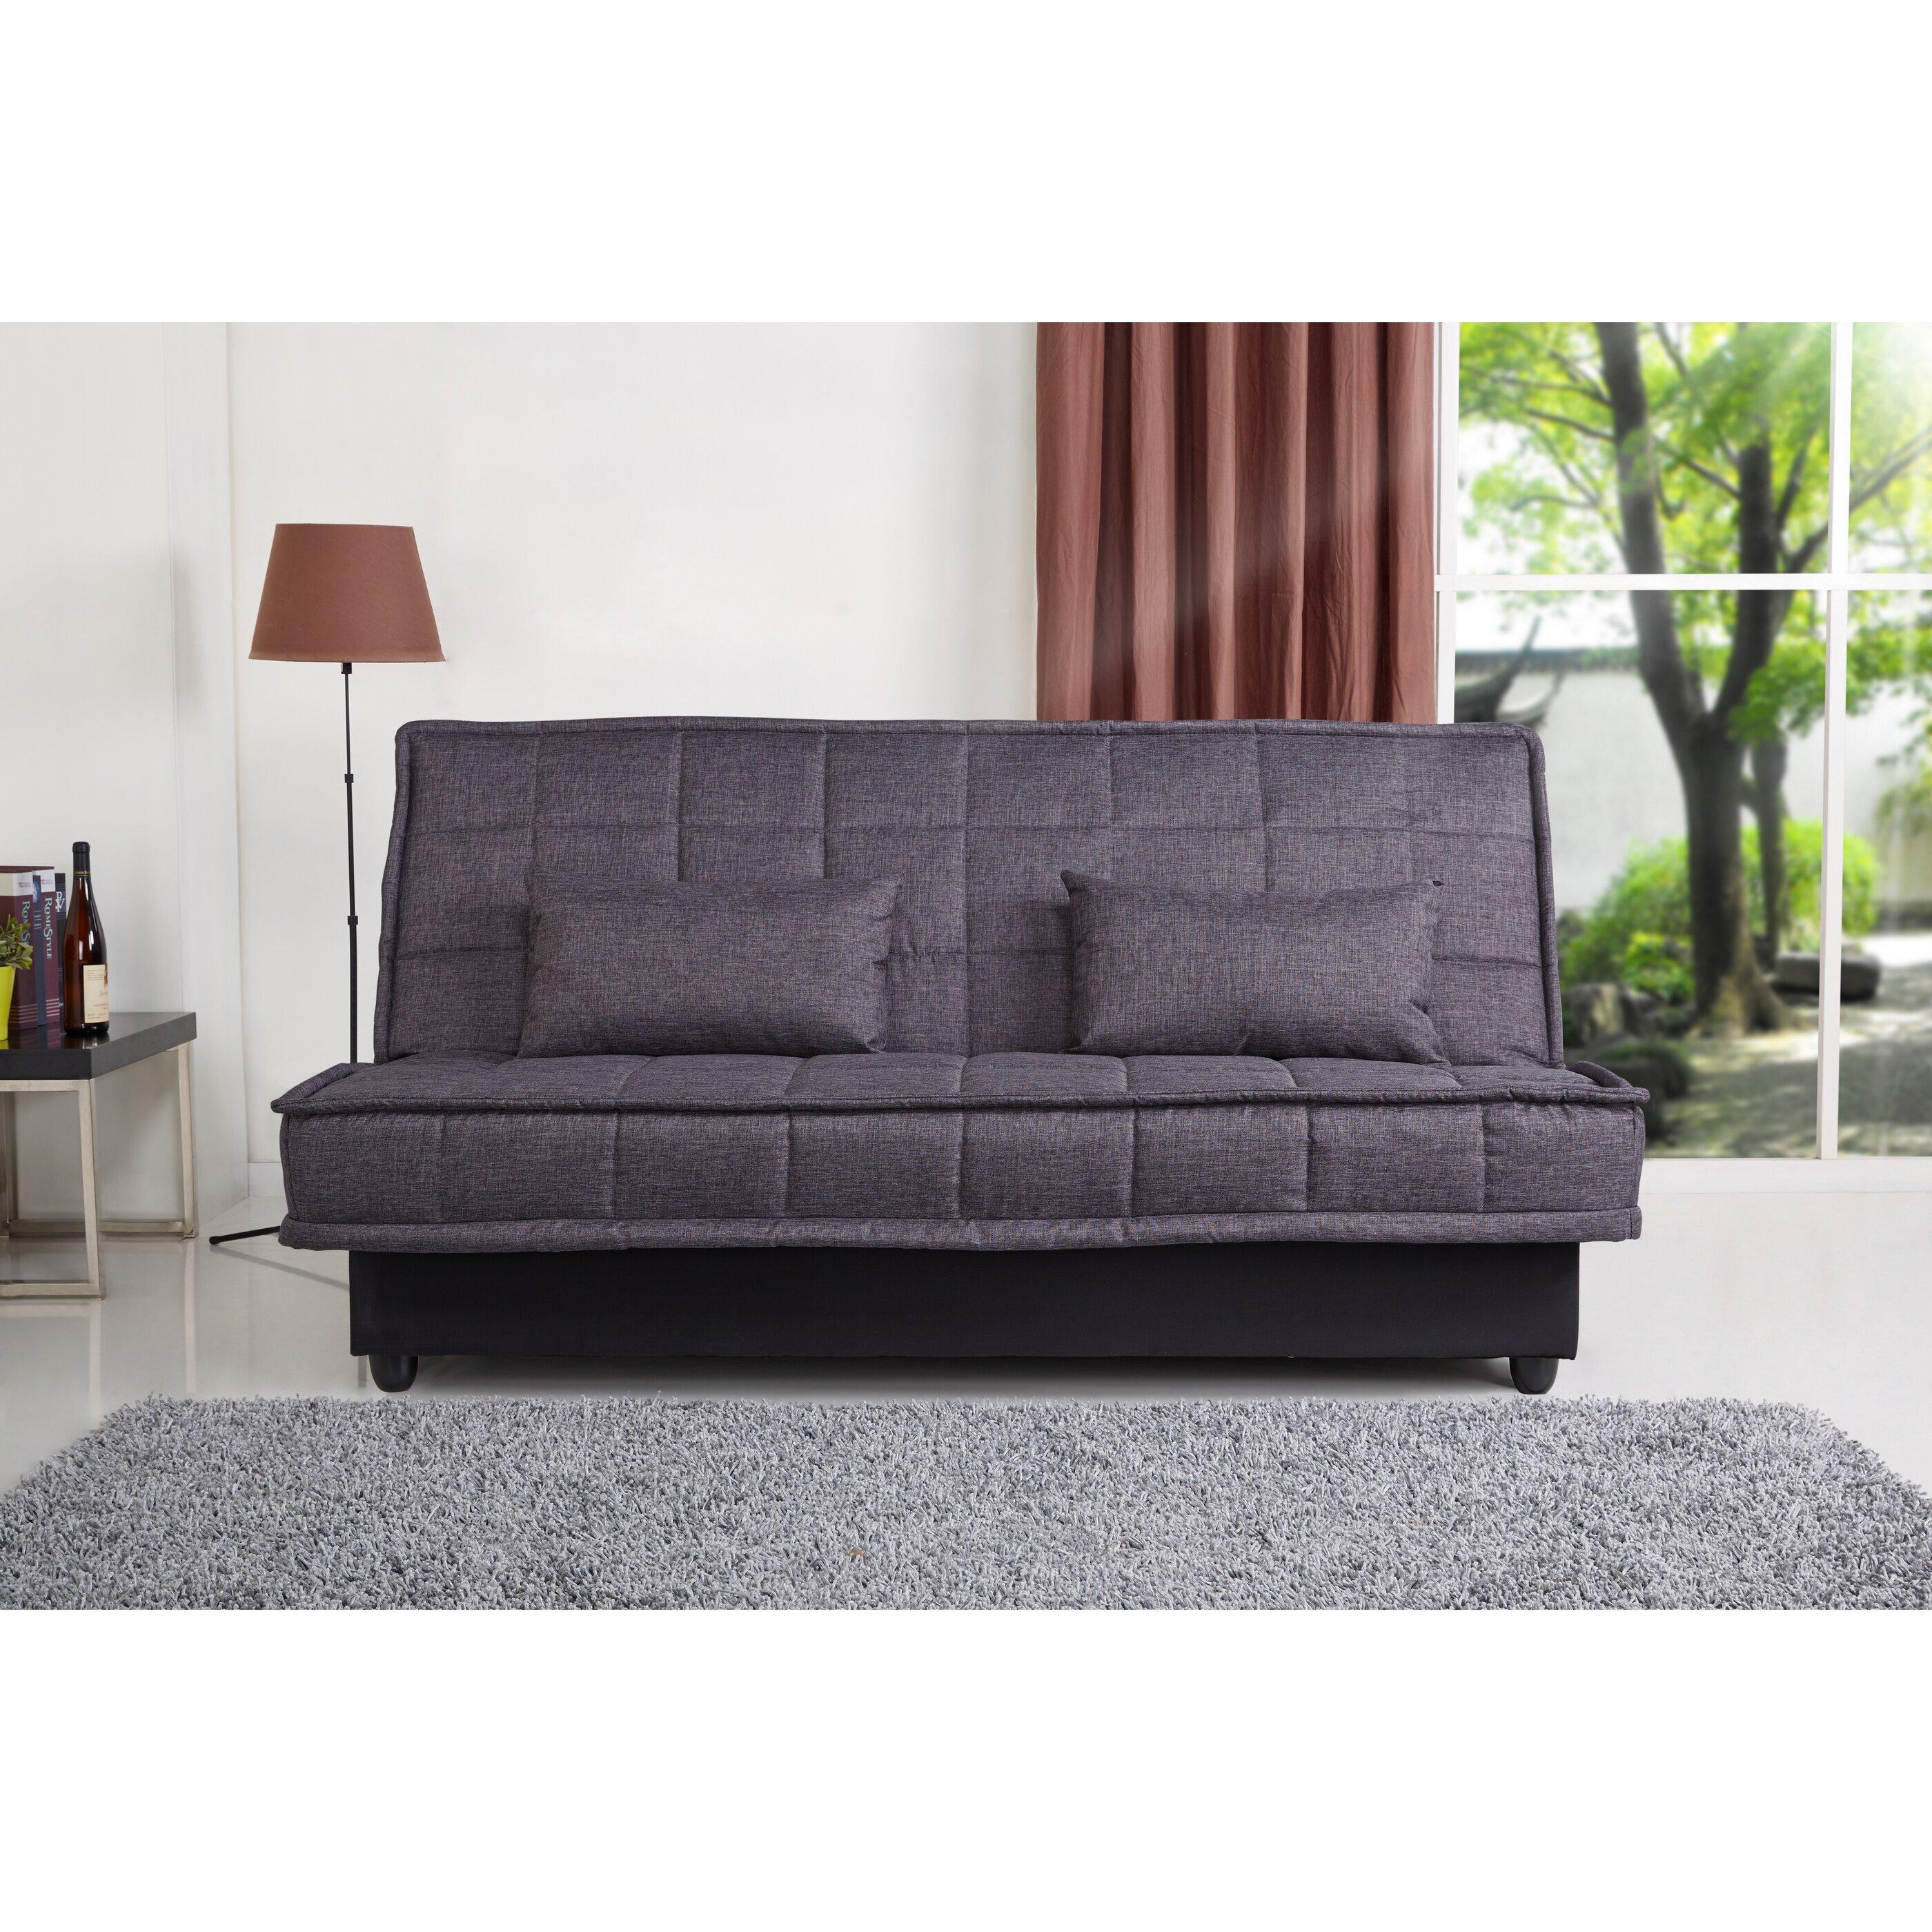 leader lifestyle 3 sitzer schlafsofa yoko bewertungen. Black Bedroom Furniture Sets. Home Design Ideas